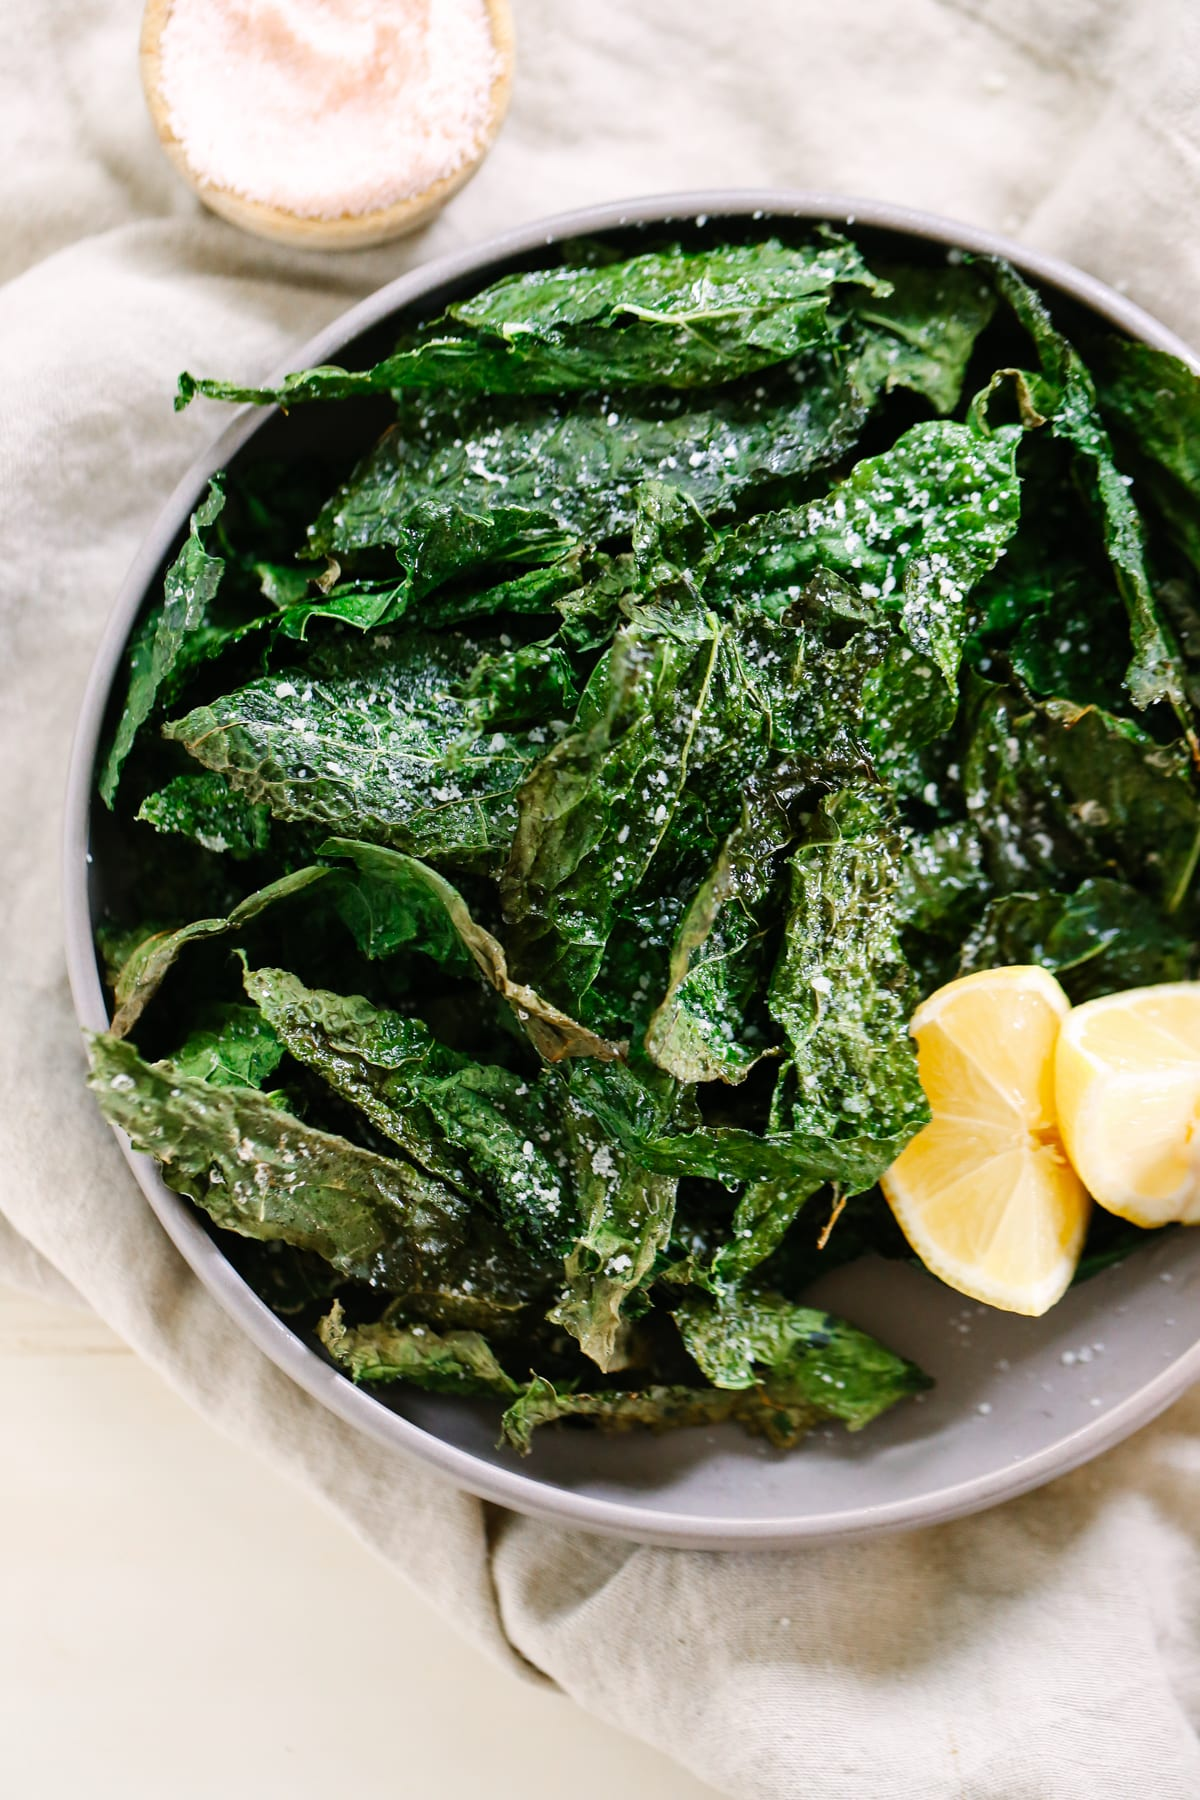 how to make kale palatable